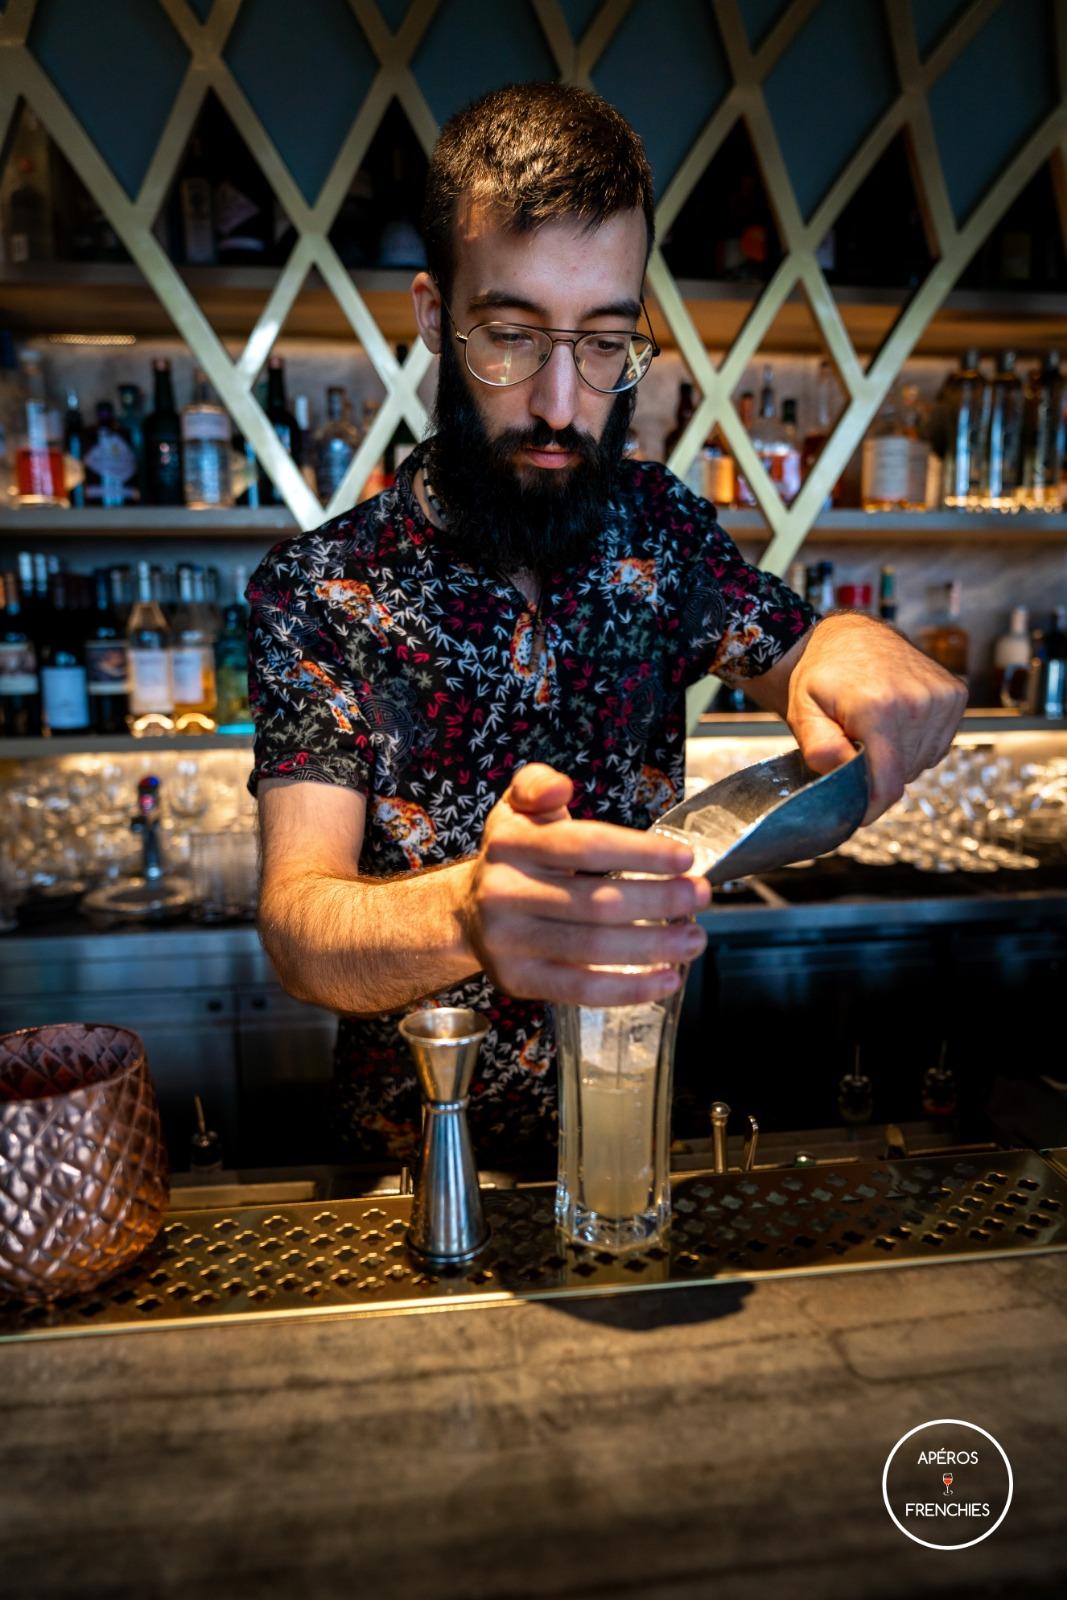 Bartender mixing St Germain